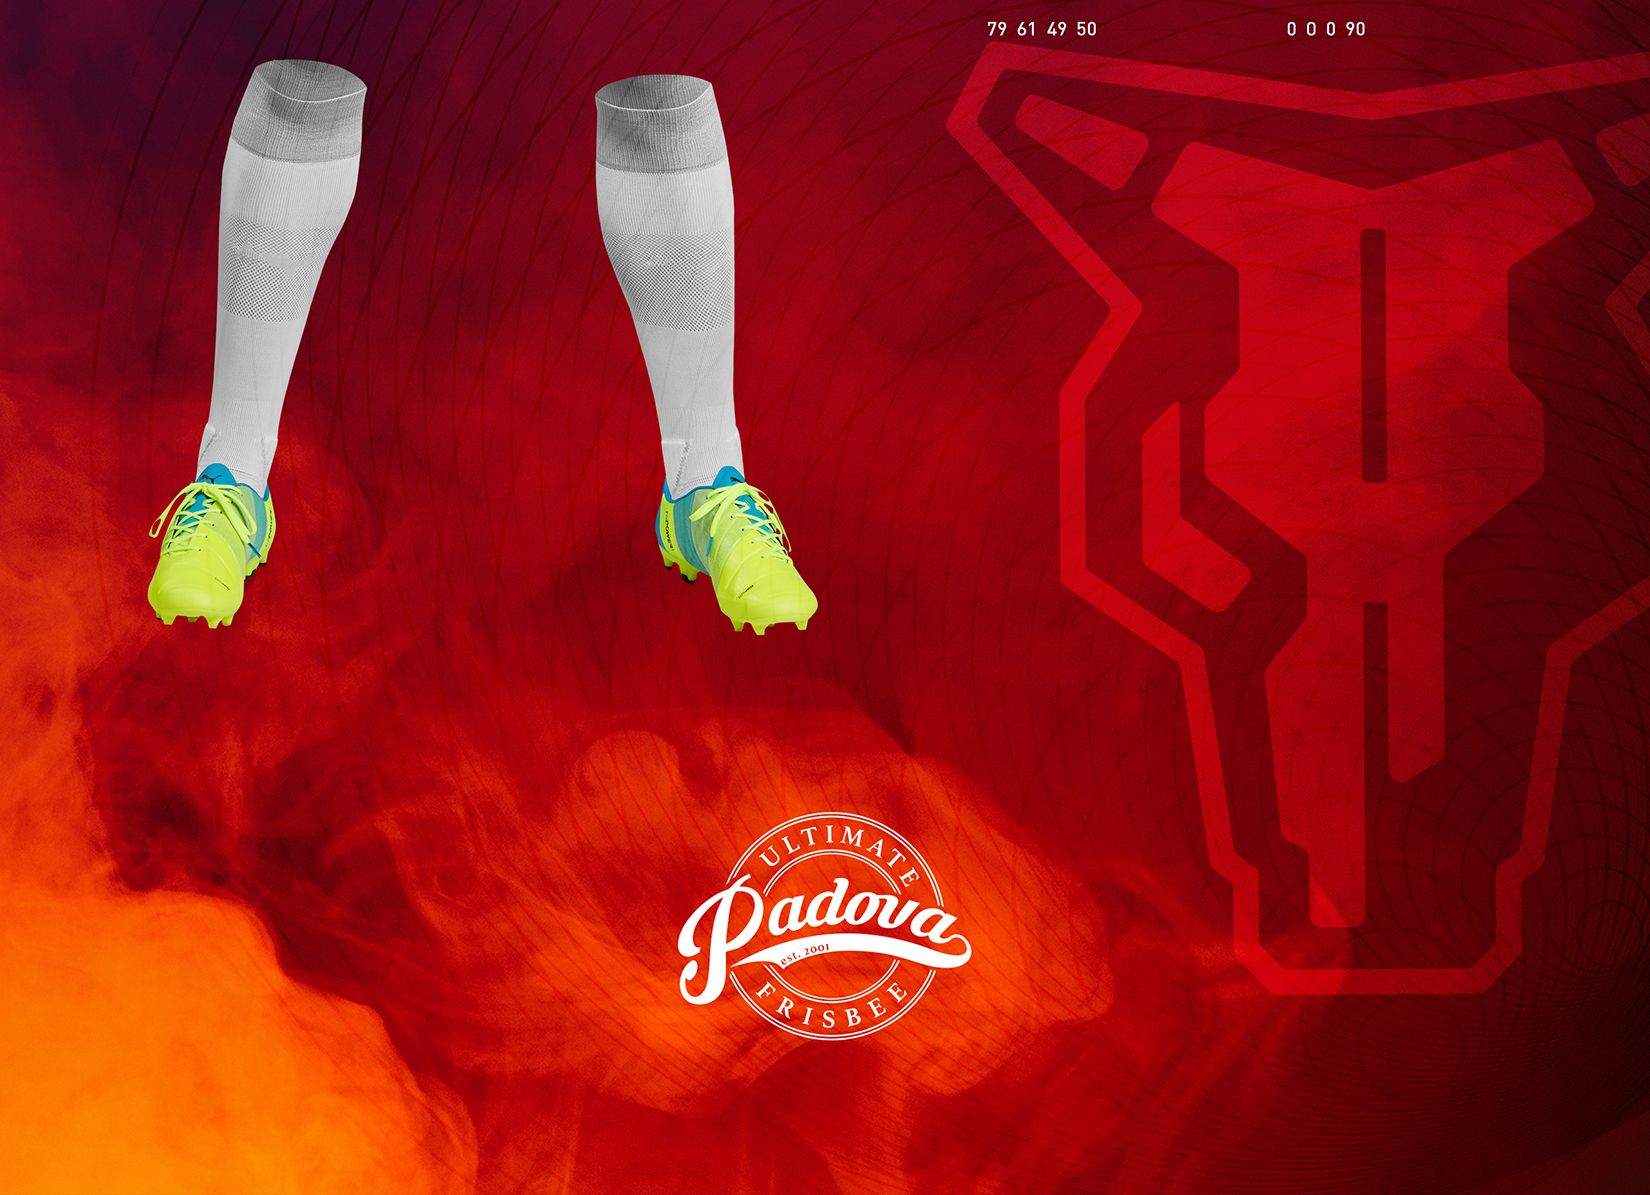 Grafica Pubblicitaria Design-Kit-Gara Cus-Padova-Ultimate-Freesbee 04